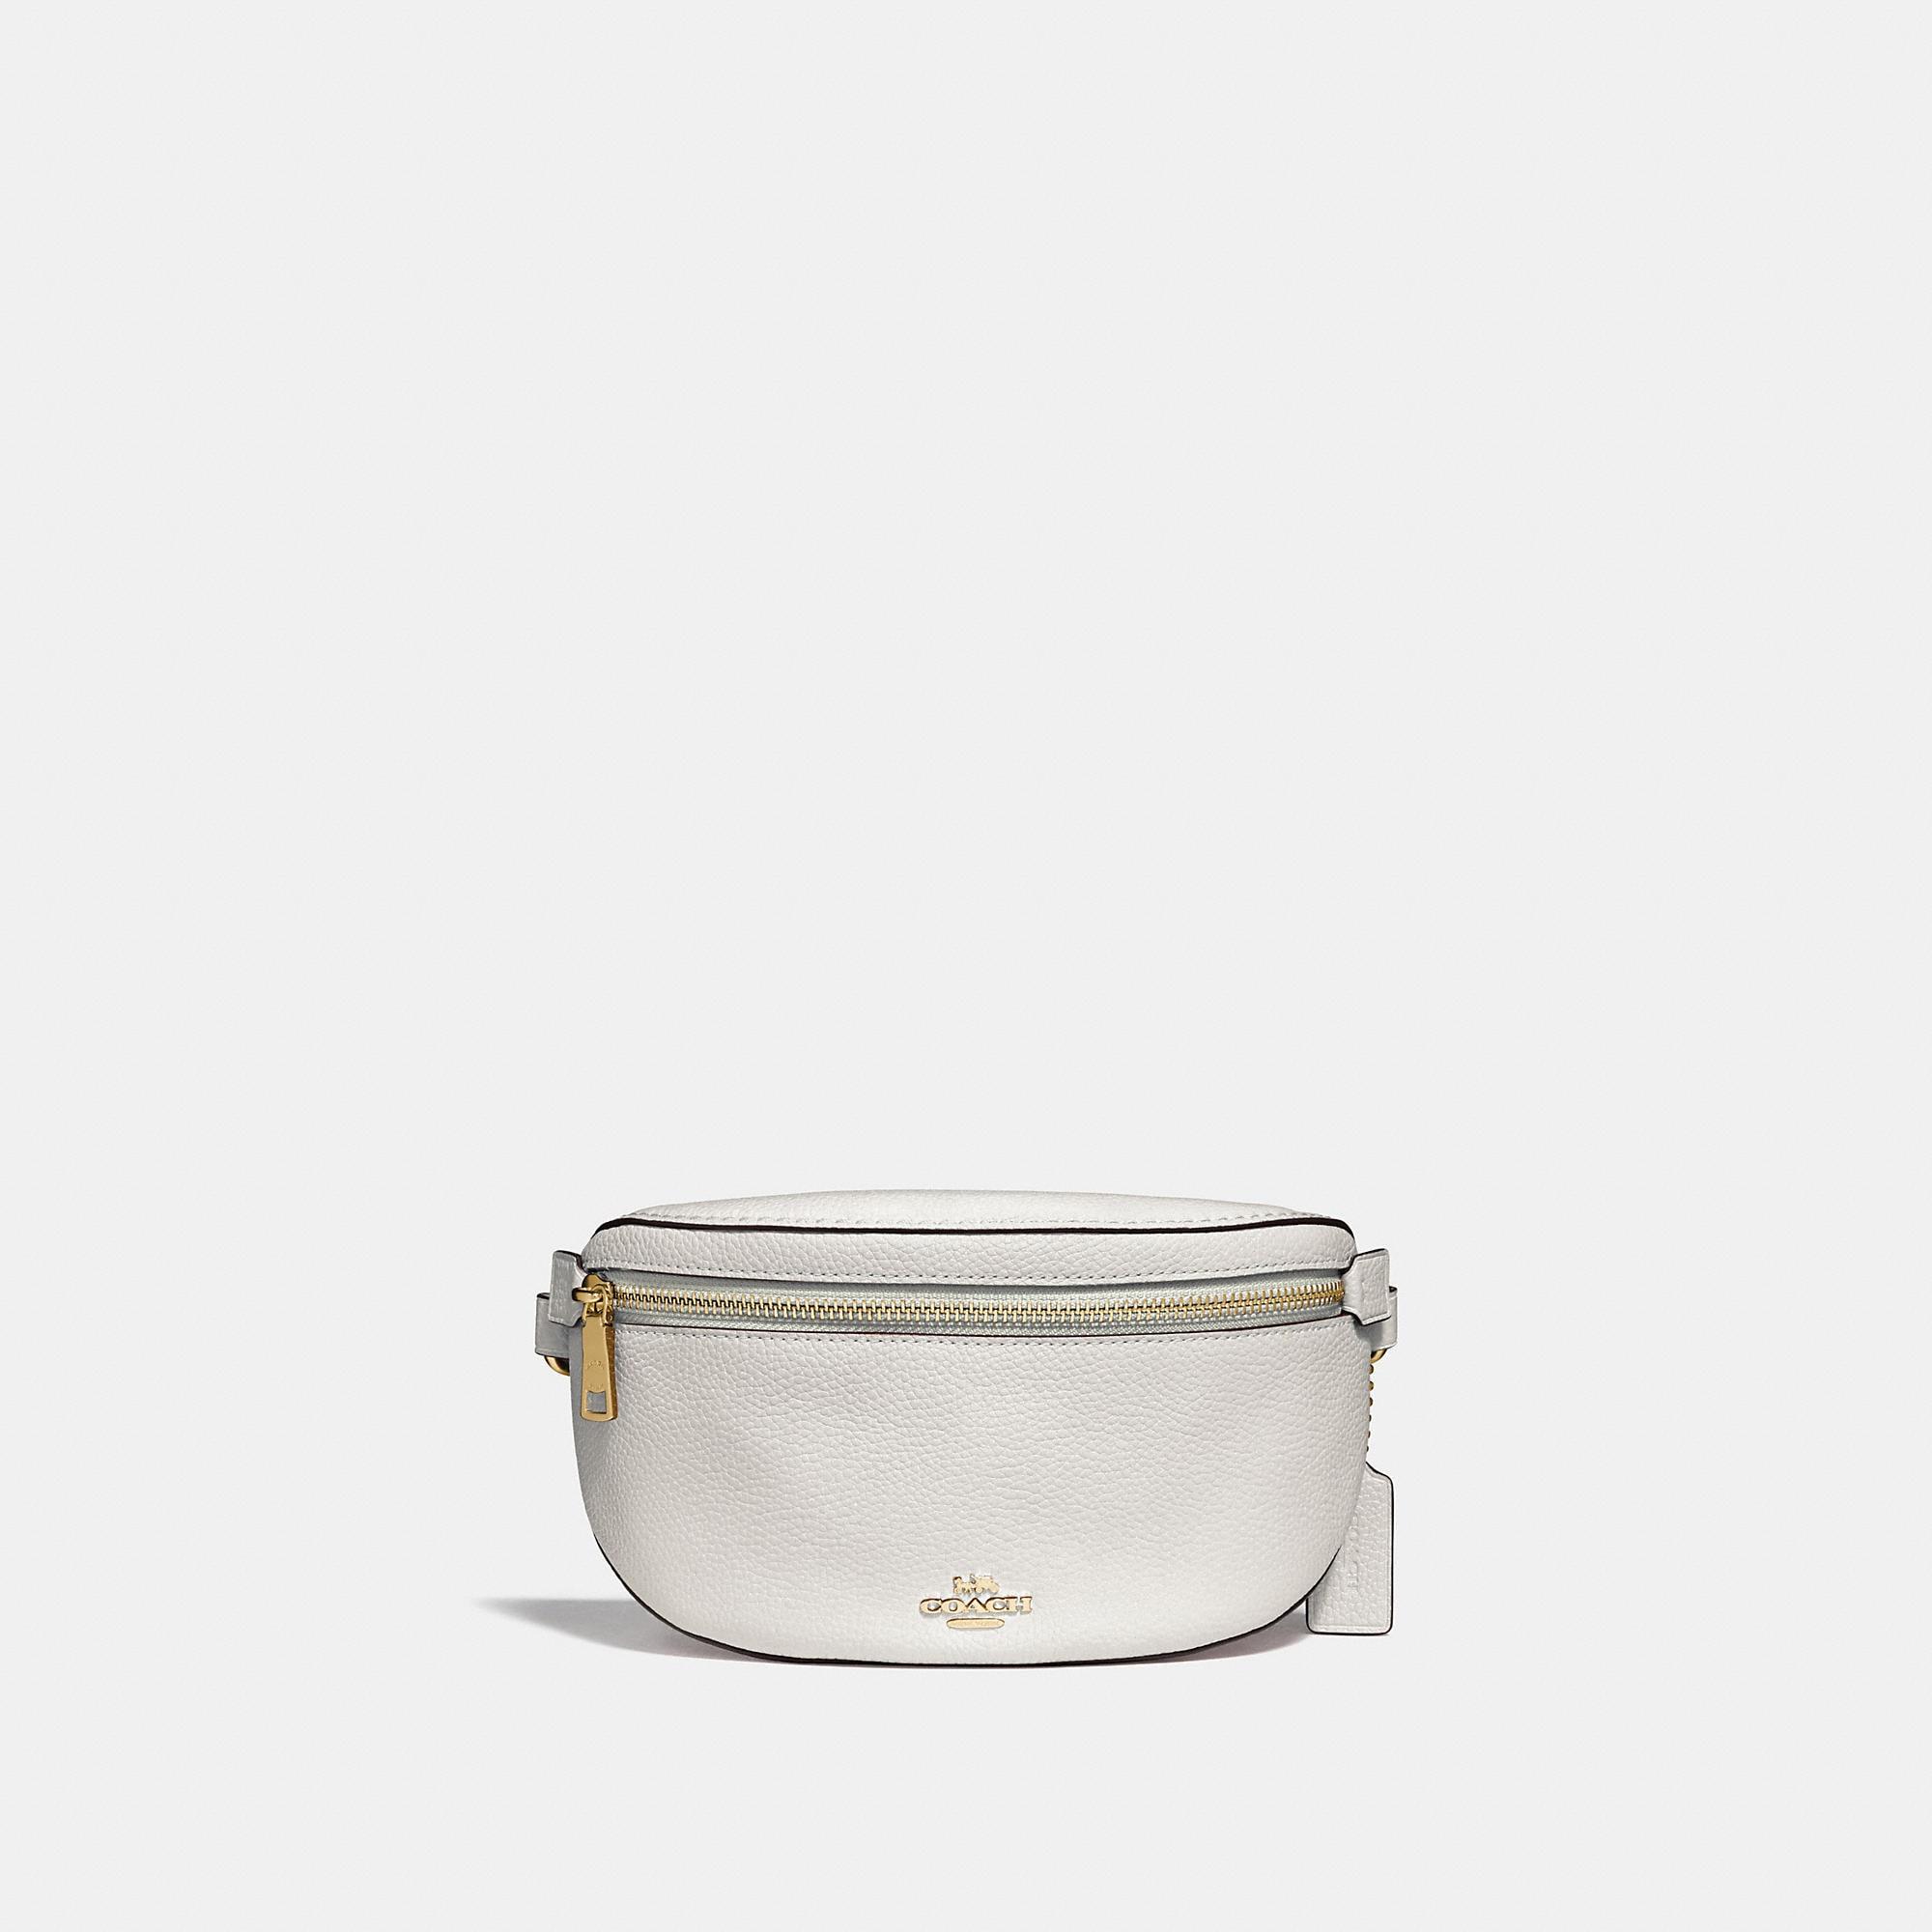 6a863ea22 Coach Belt Bag In Chalk/Gold | ModeSens